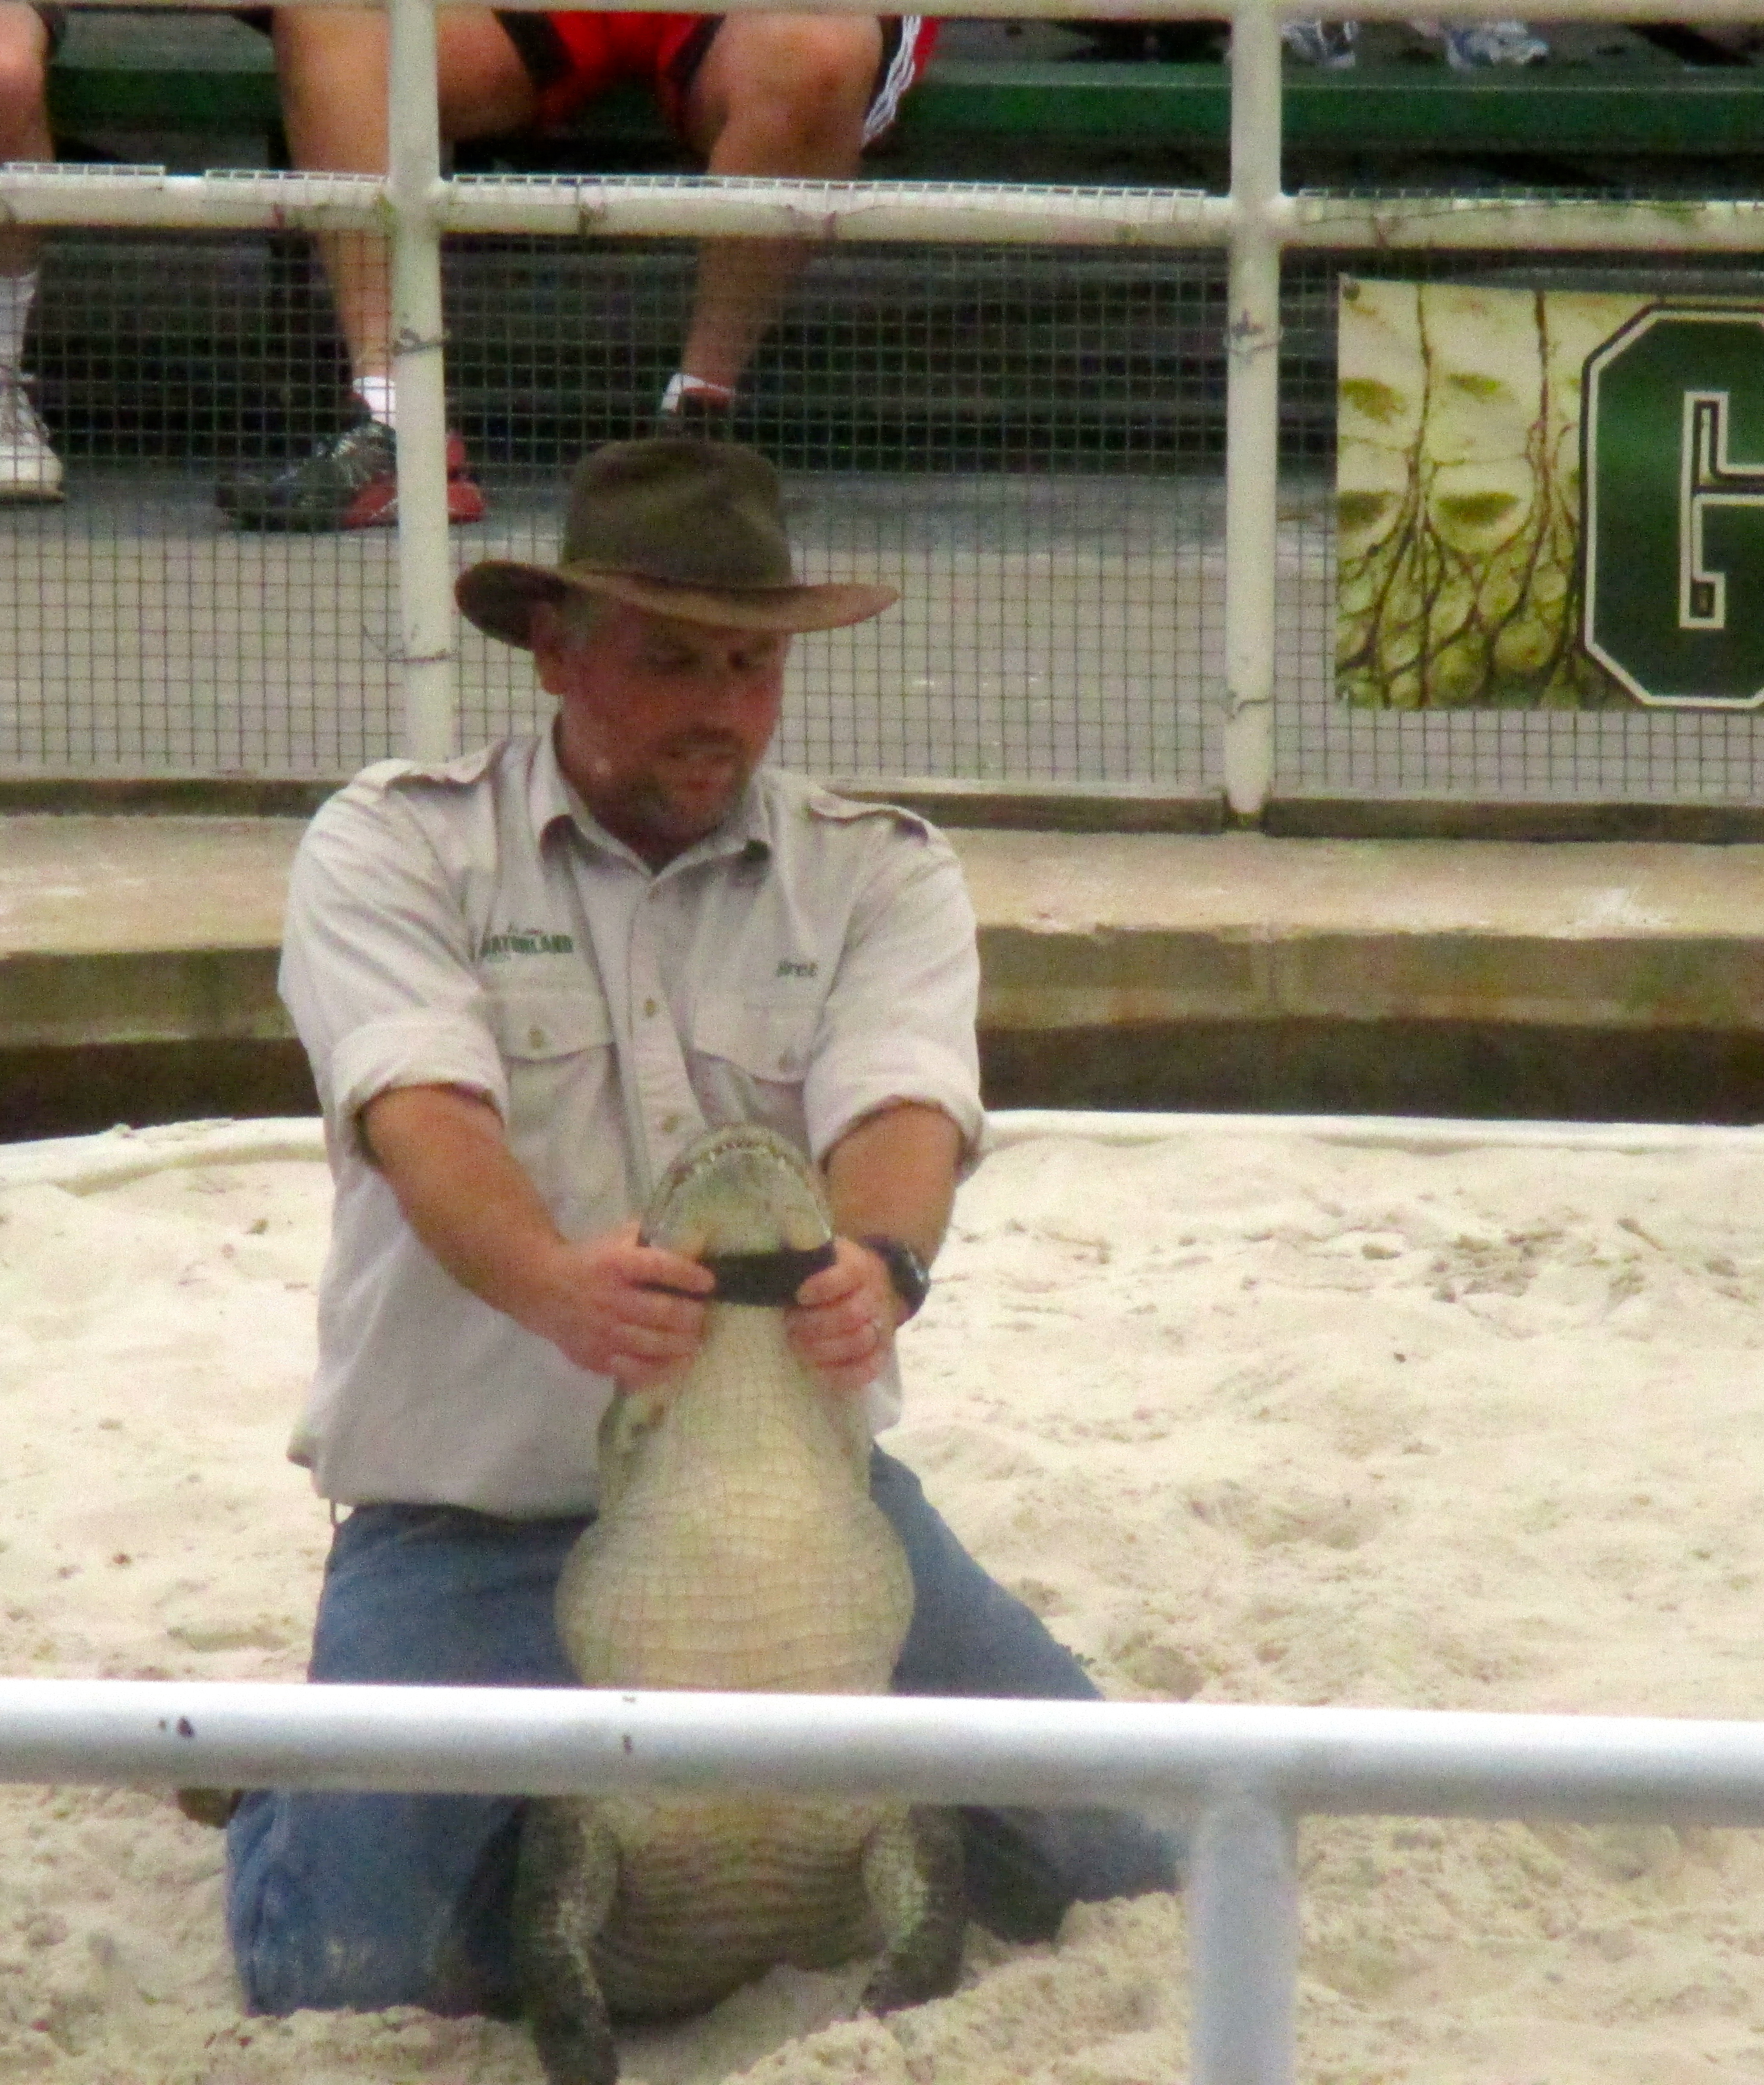 Gator Wrestling show. Copyright Gretta Schifano